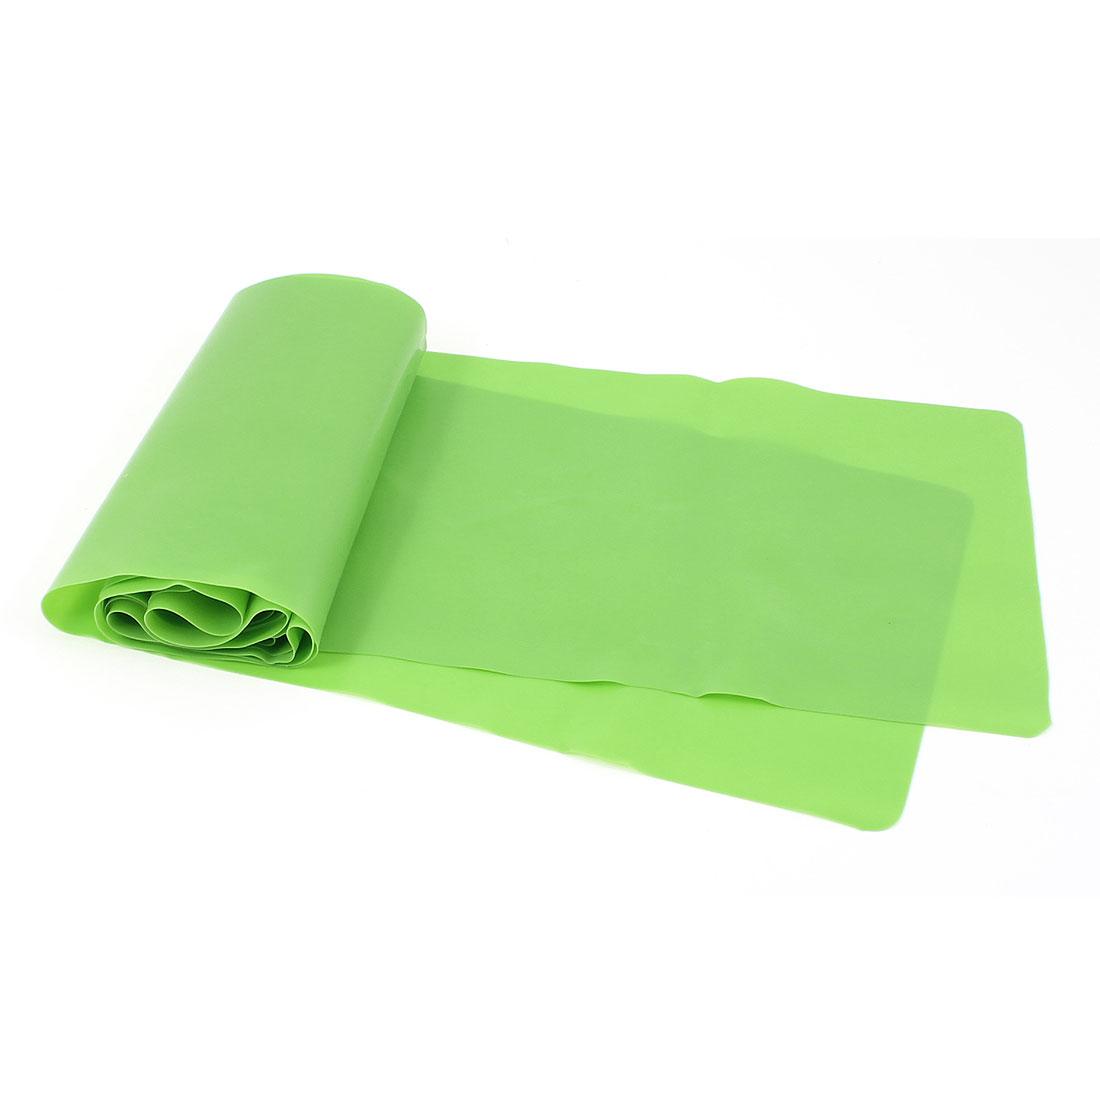 Multifunction Body Exercise Green Rubber Elastic Bandage 150 x 12cm